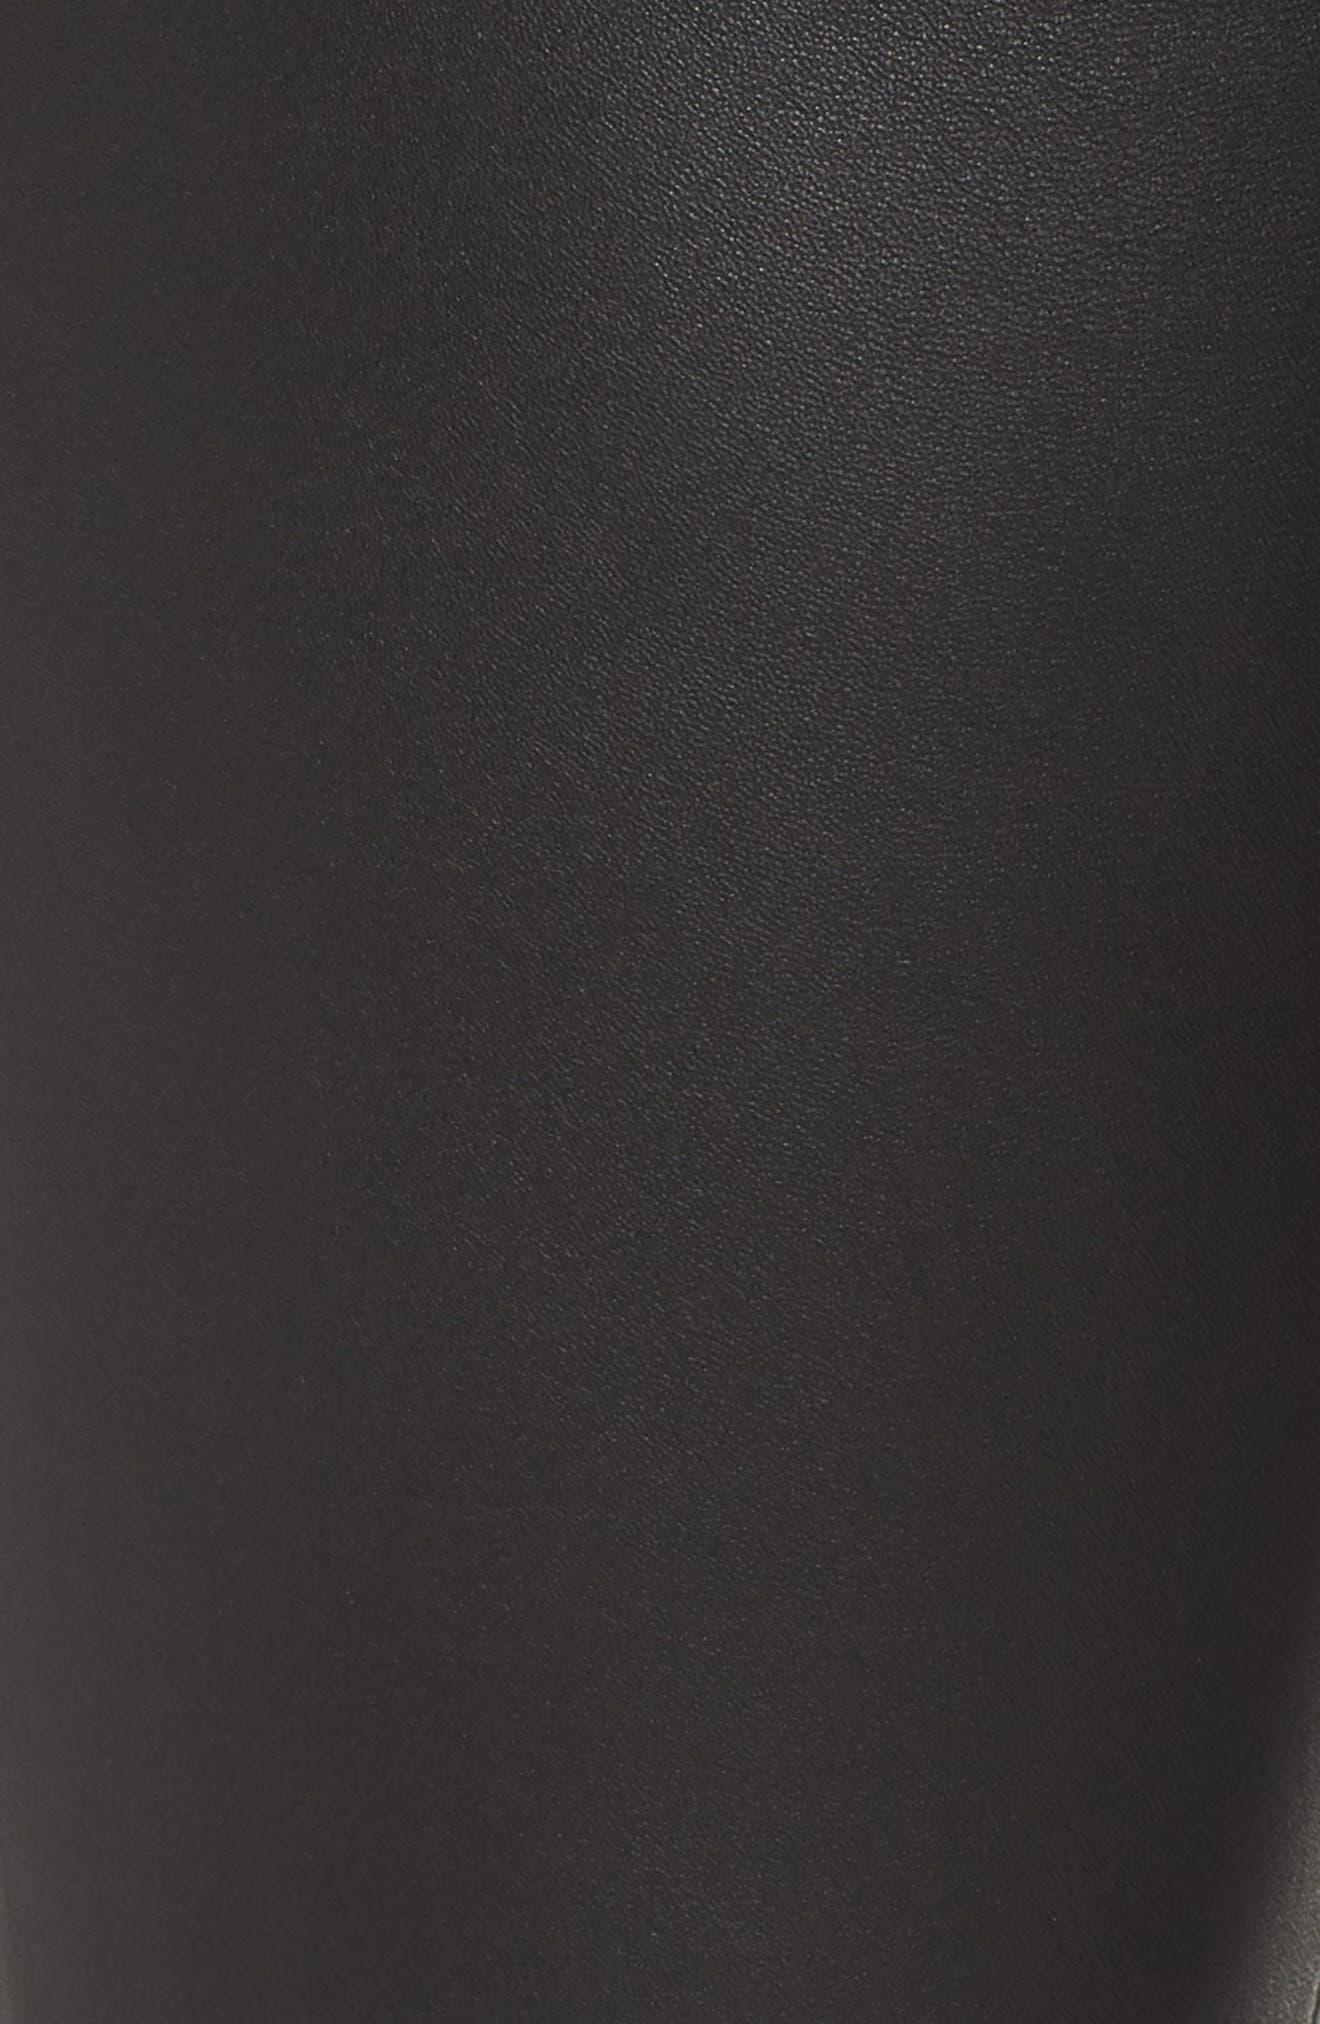 Eboli Leather Pants,                             Alternate thumbnail 6, color,                             001